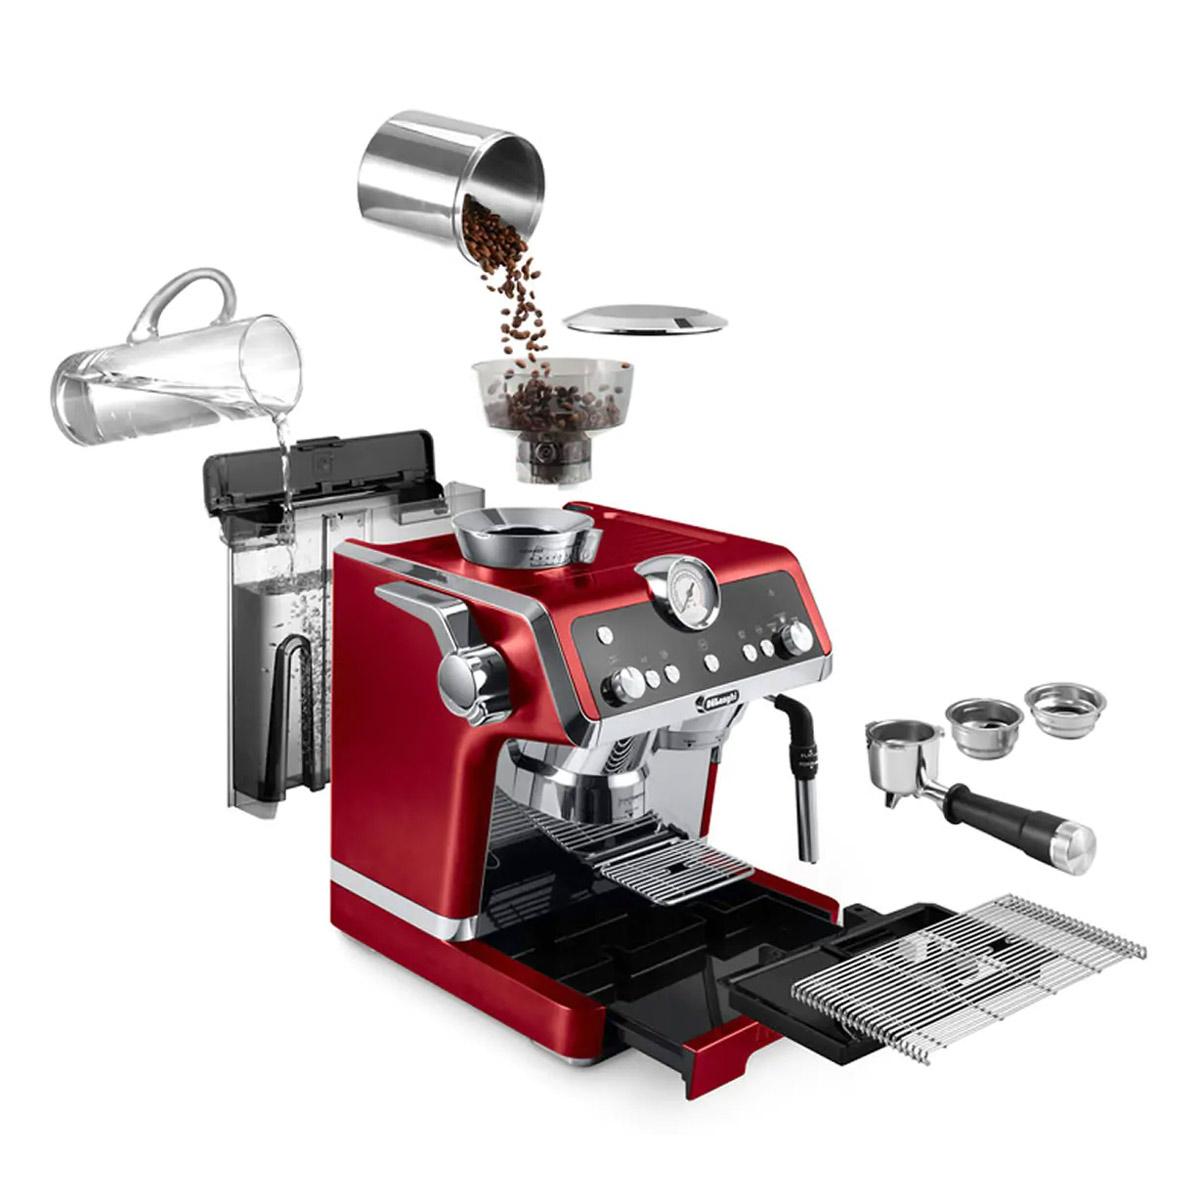 DeLonghi La Specialista Semi-Automatic Espresso Machine with Built-in Grinder Red - EC9335R